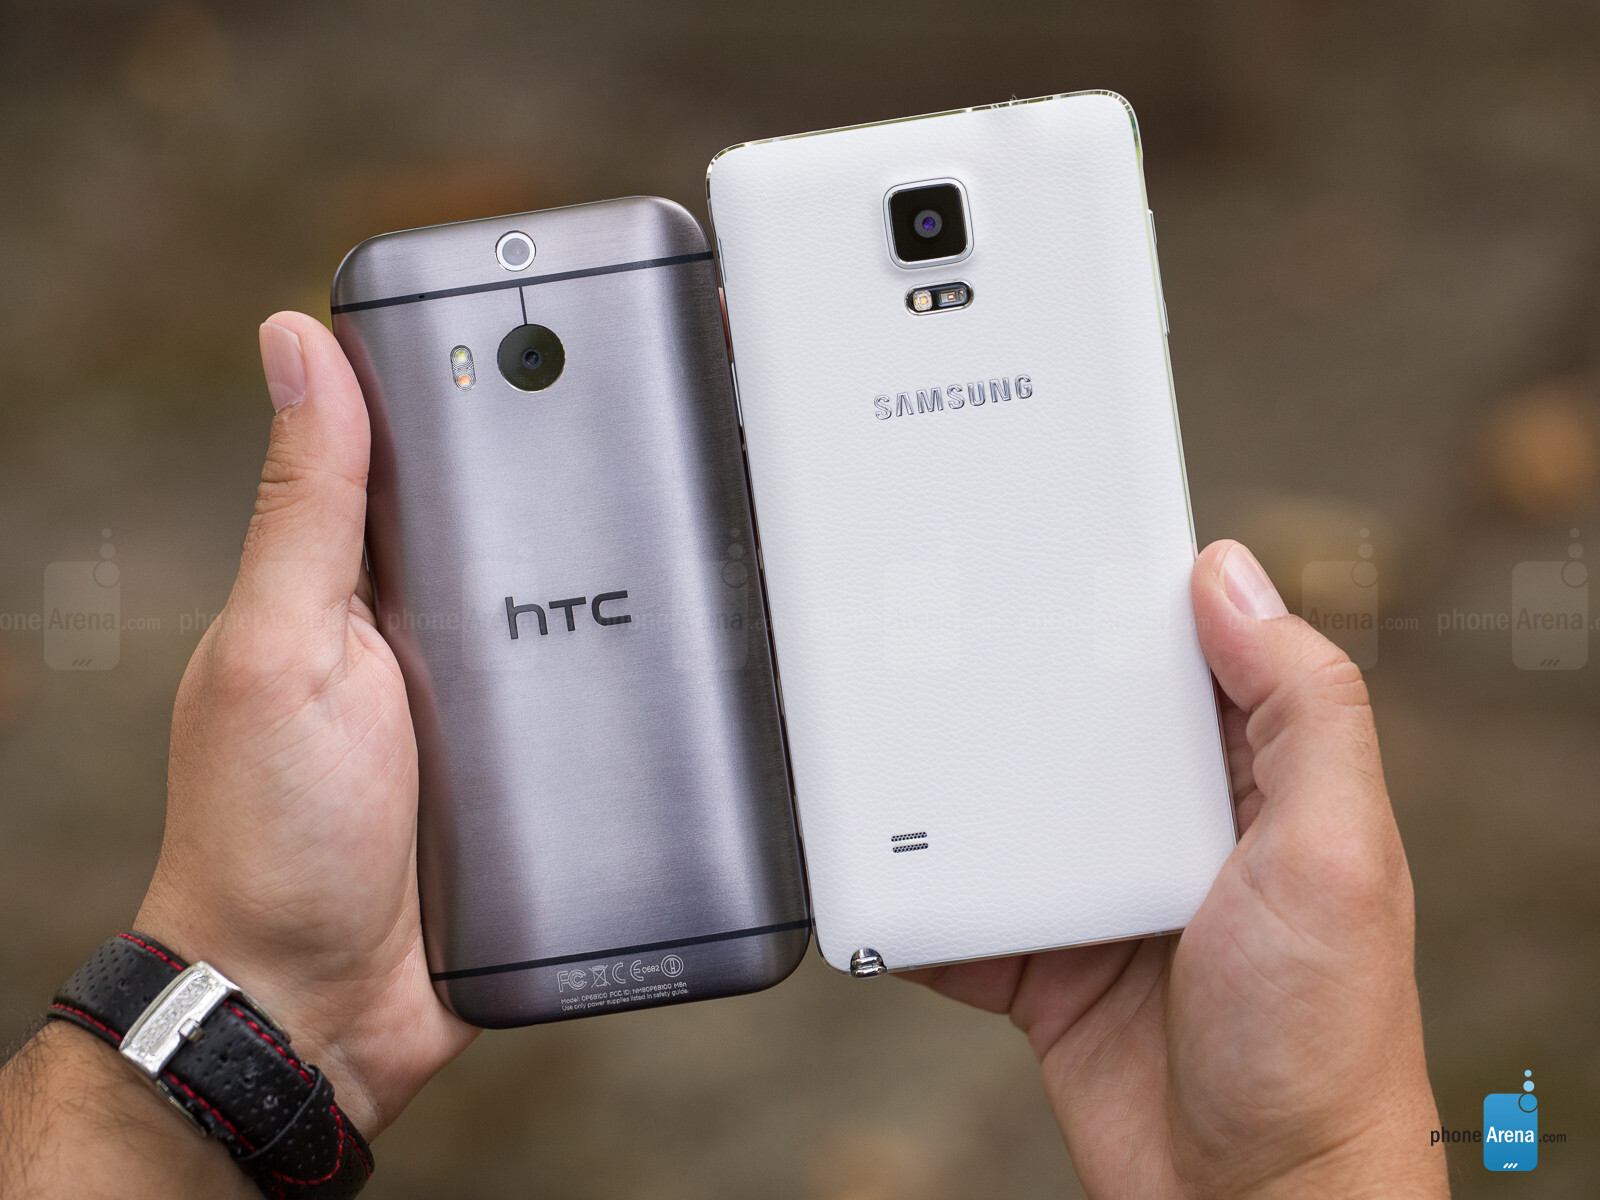 Samsung galaxy note 5 vs htc one m9 plus a comparison - Samsung Galaxy Note 5 Vs Htc One M9 Plus A Comparison 23